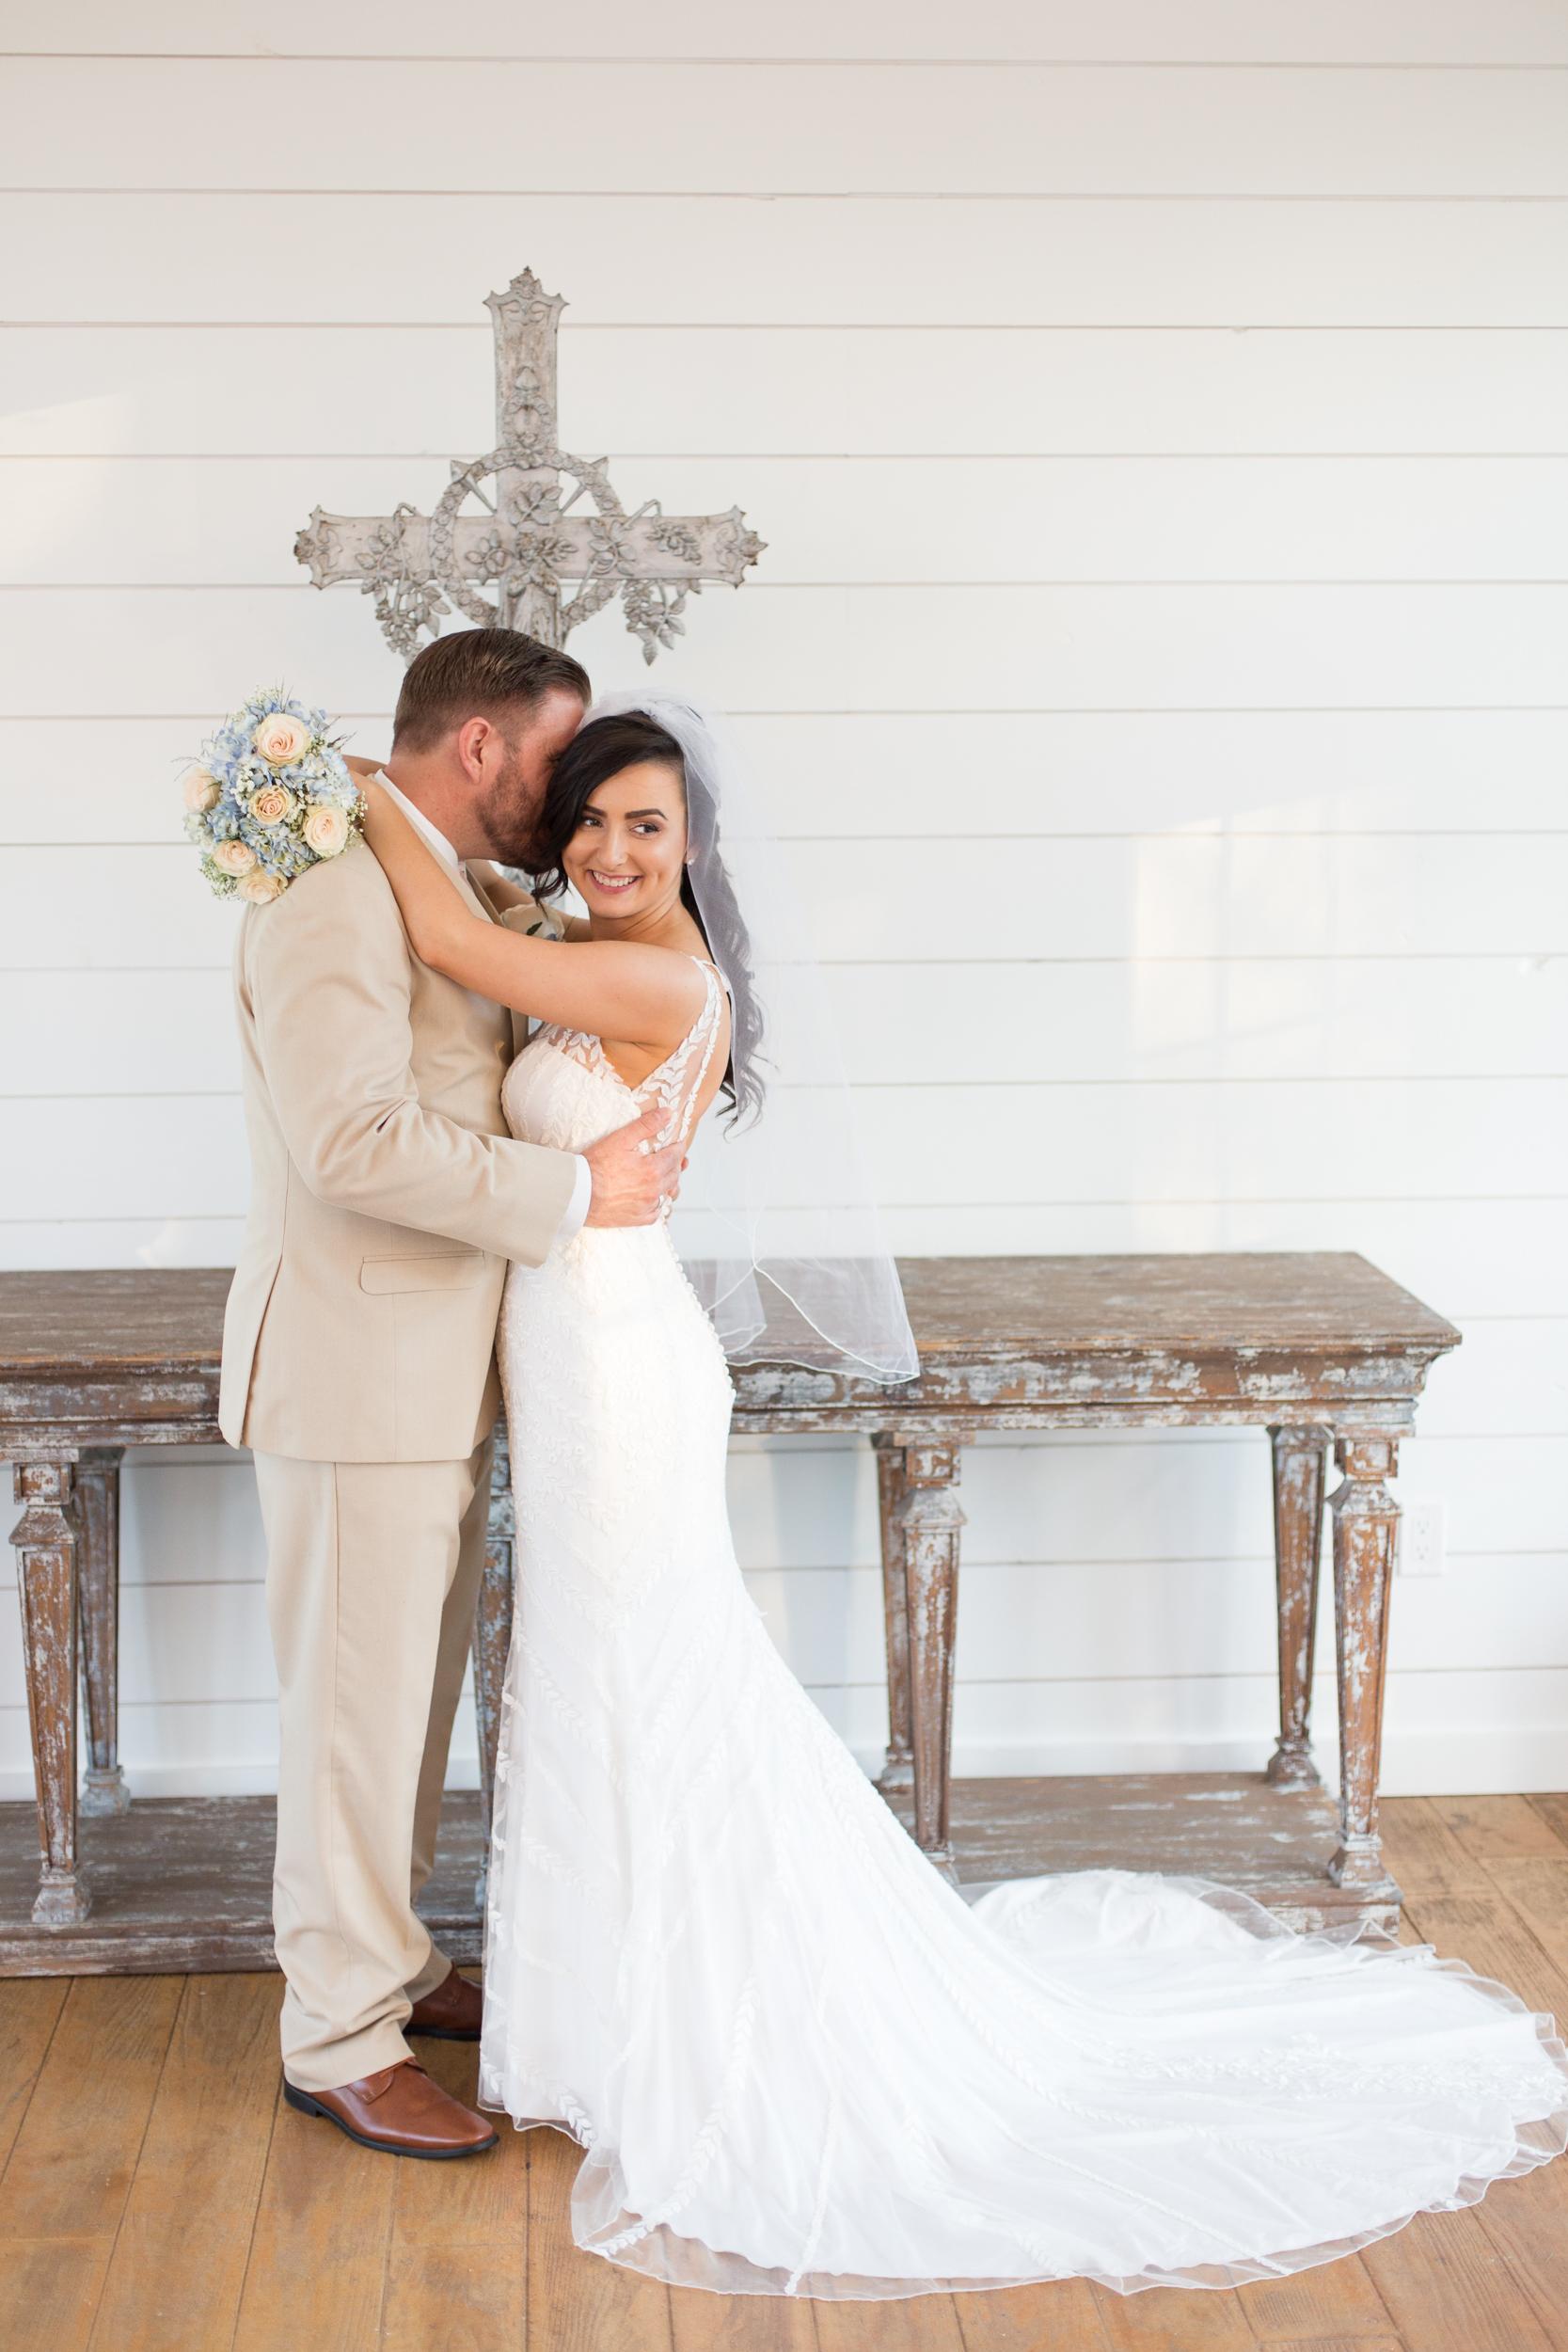 Zihlman-East TX Wedding_Kelsie Hendricks Photography_The Folmar Tyler Texas-121.jpg